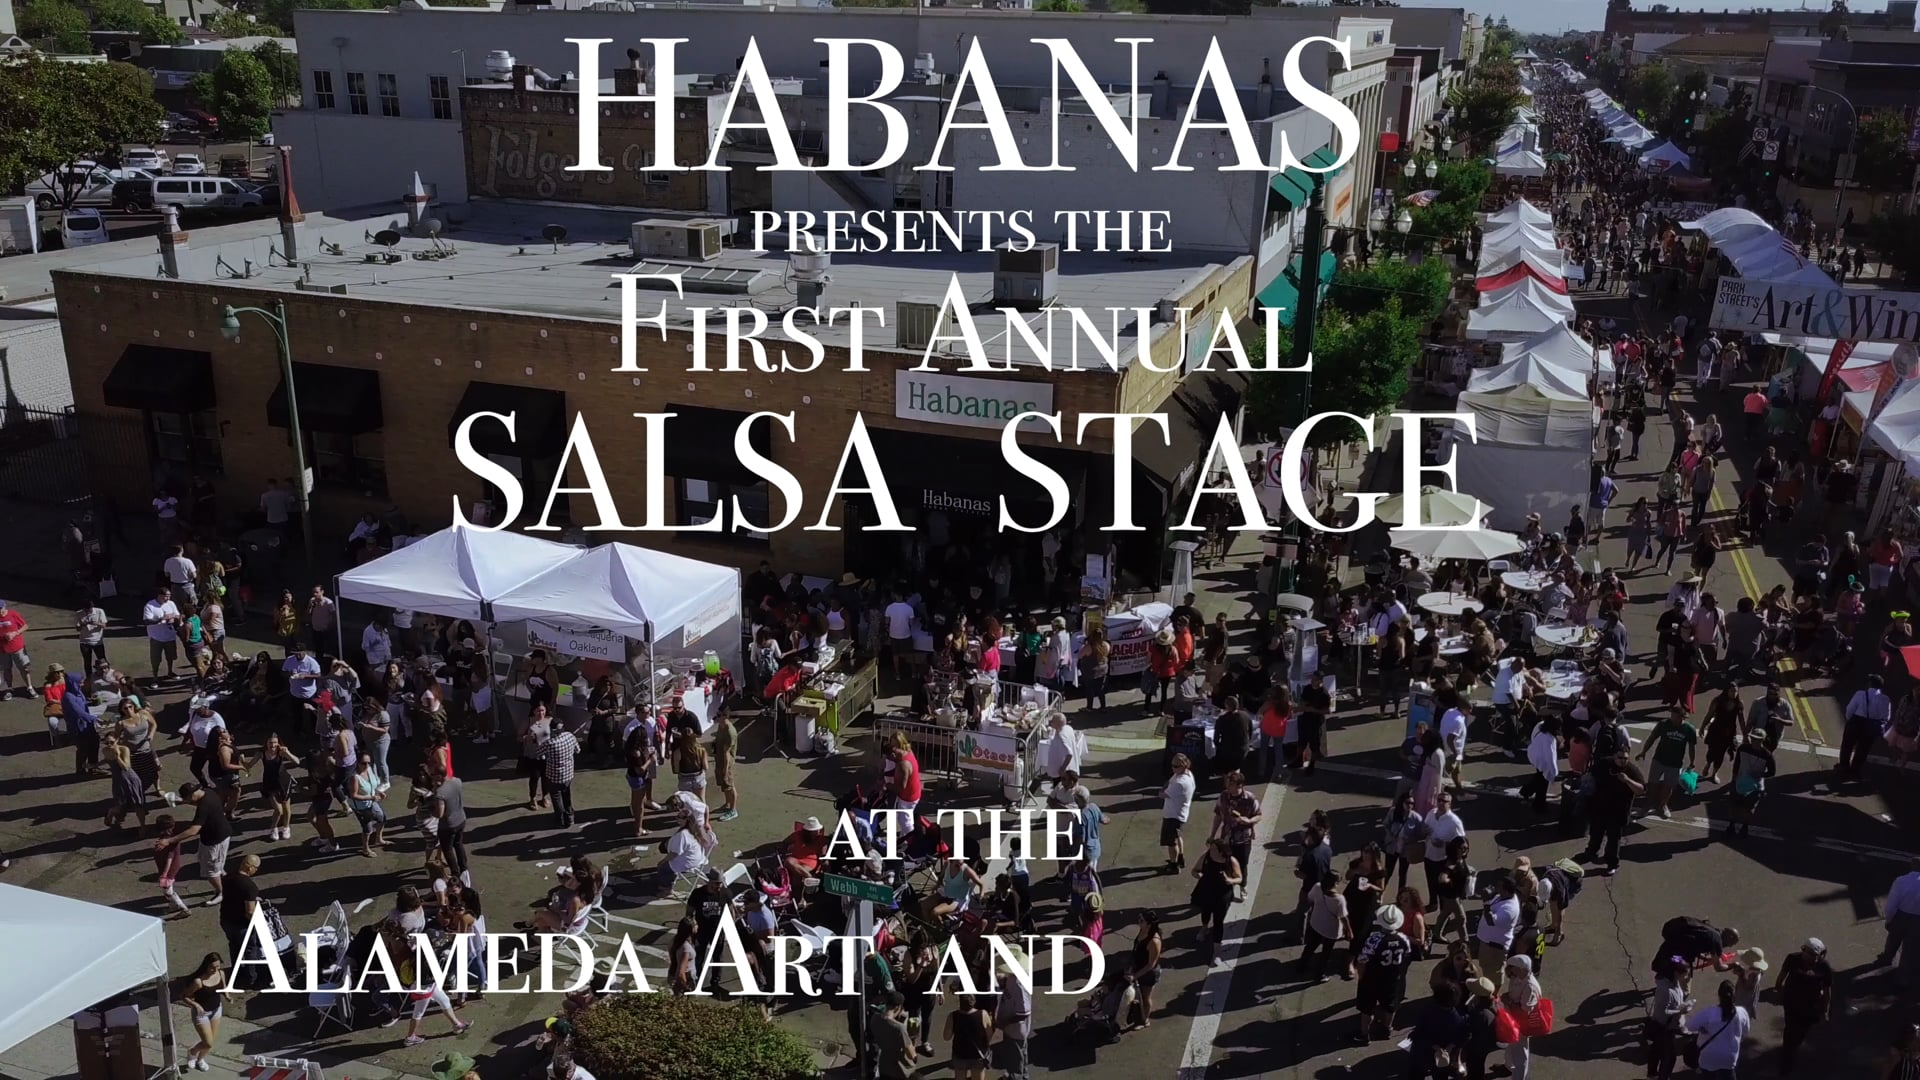 Habanas Cuban Cuisine | Salsa Stage Recap